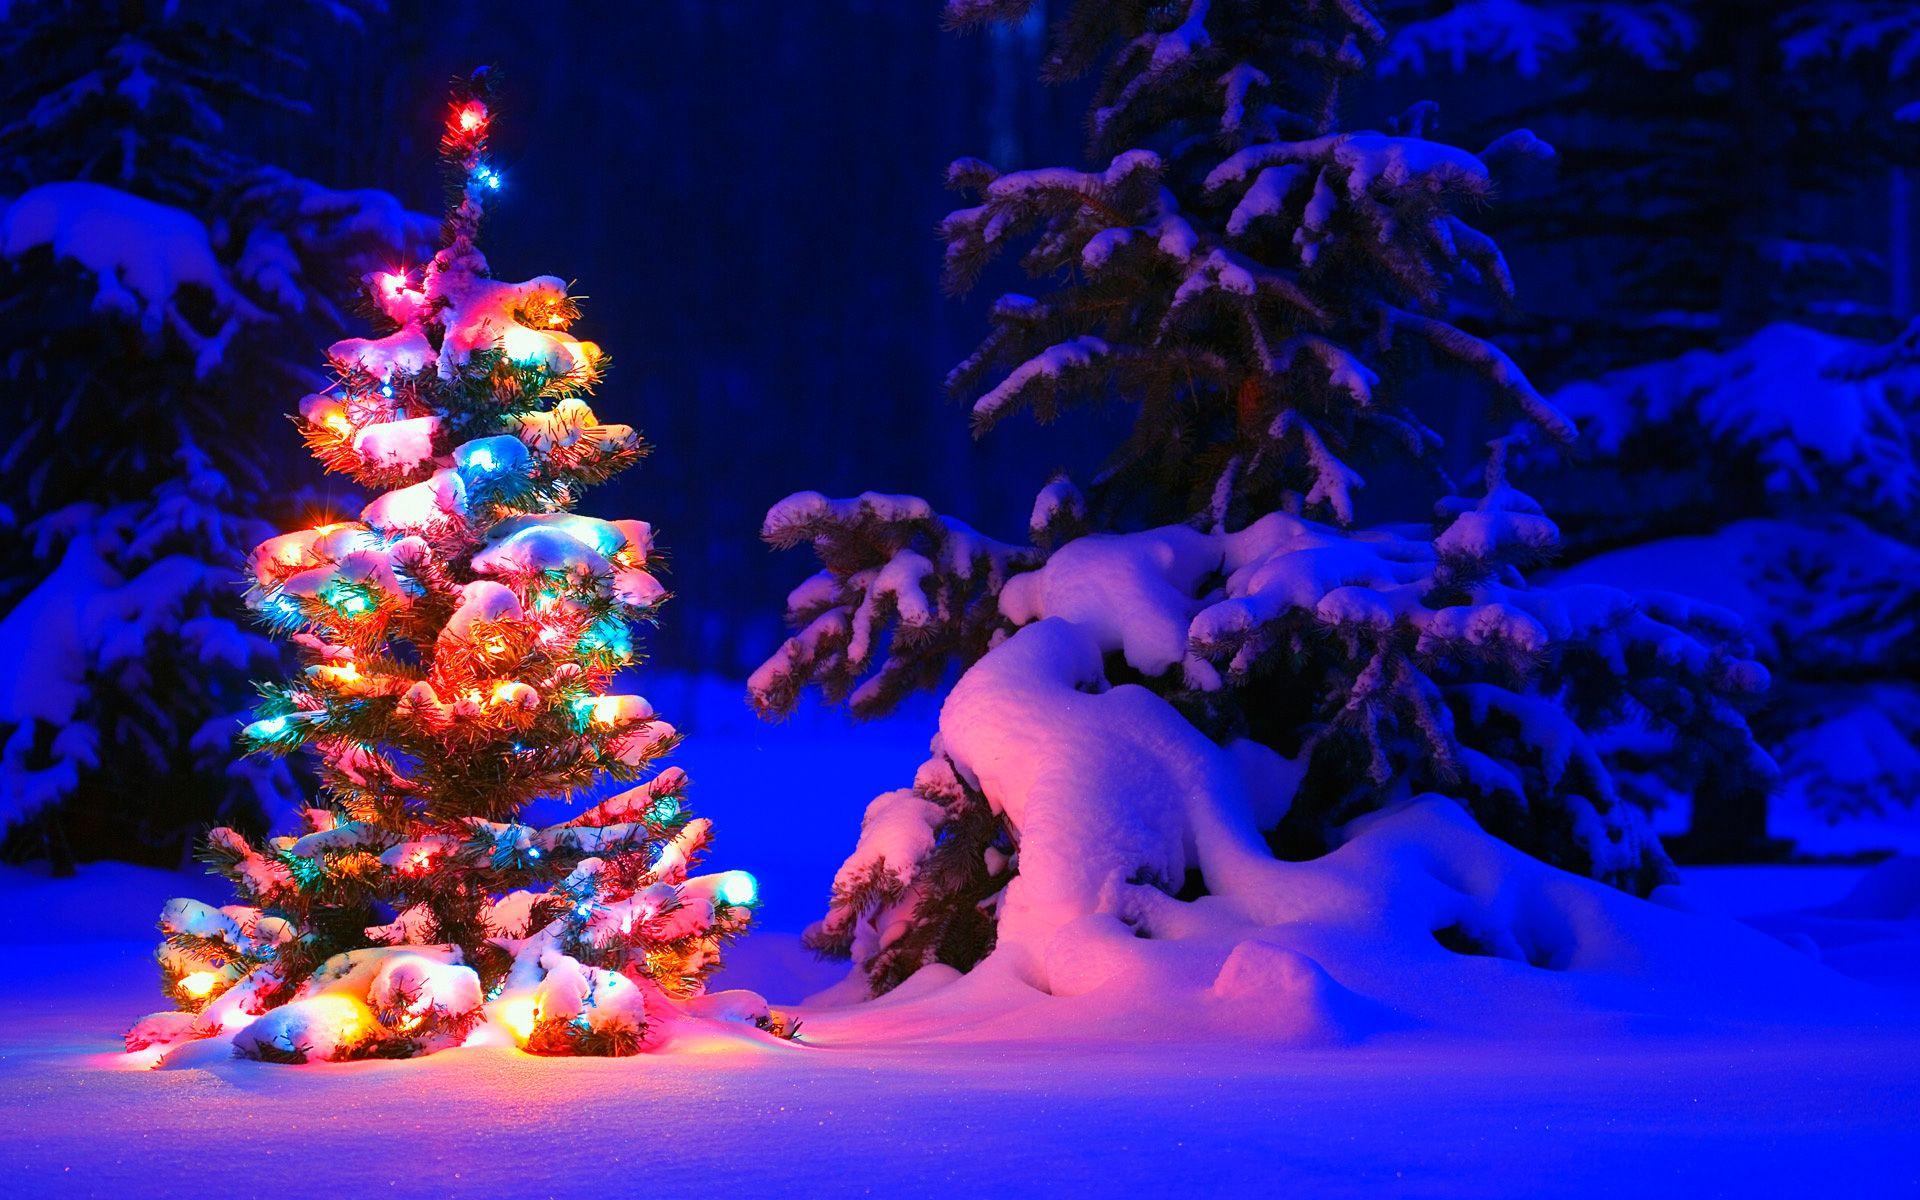 It S Christmas Time Christmas Desktop Snowy Christmas Tree Christmas Wallpaper Free